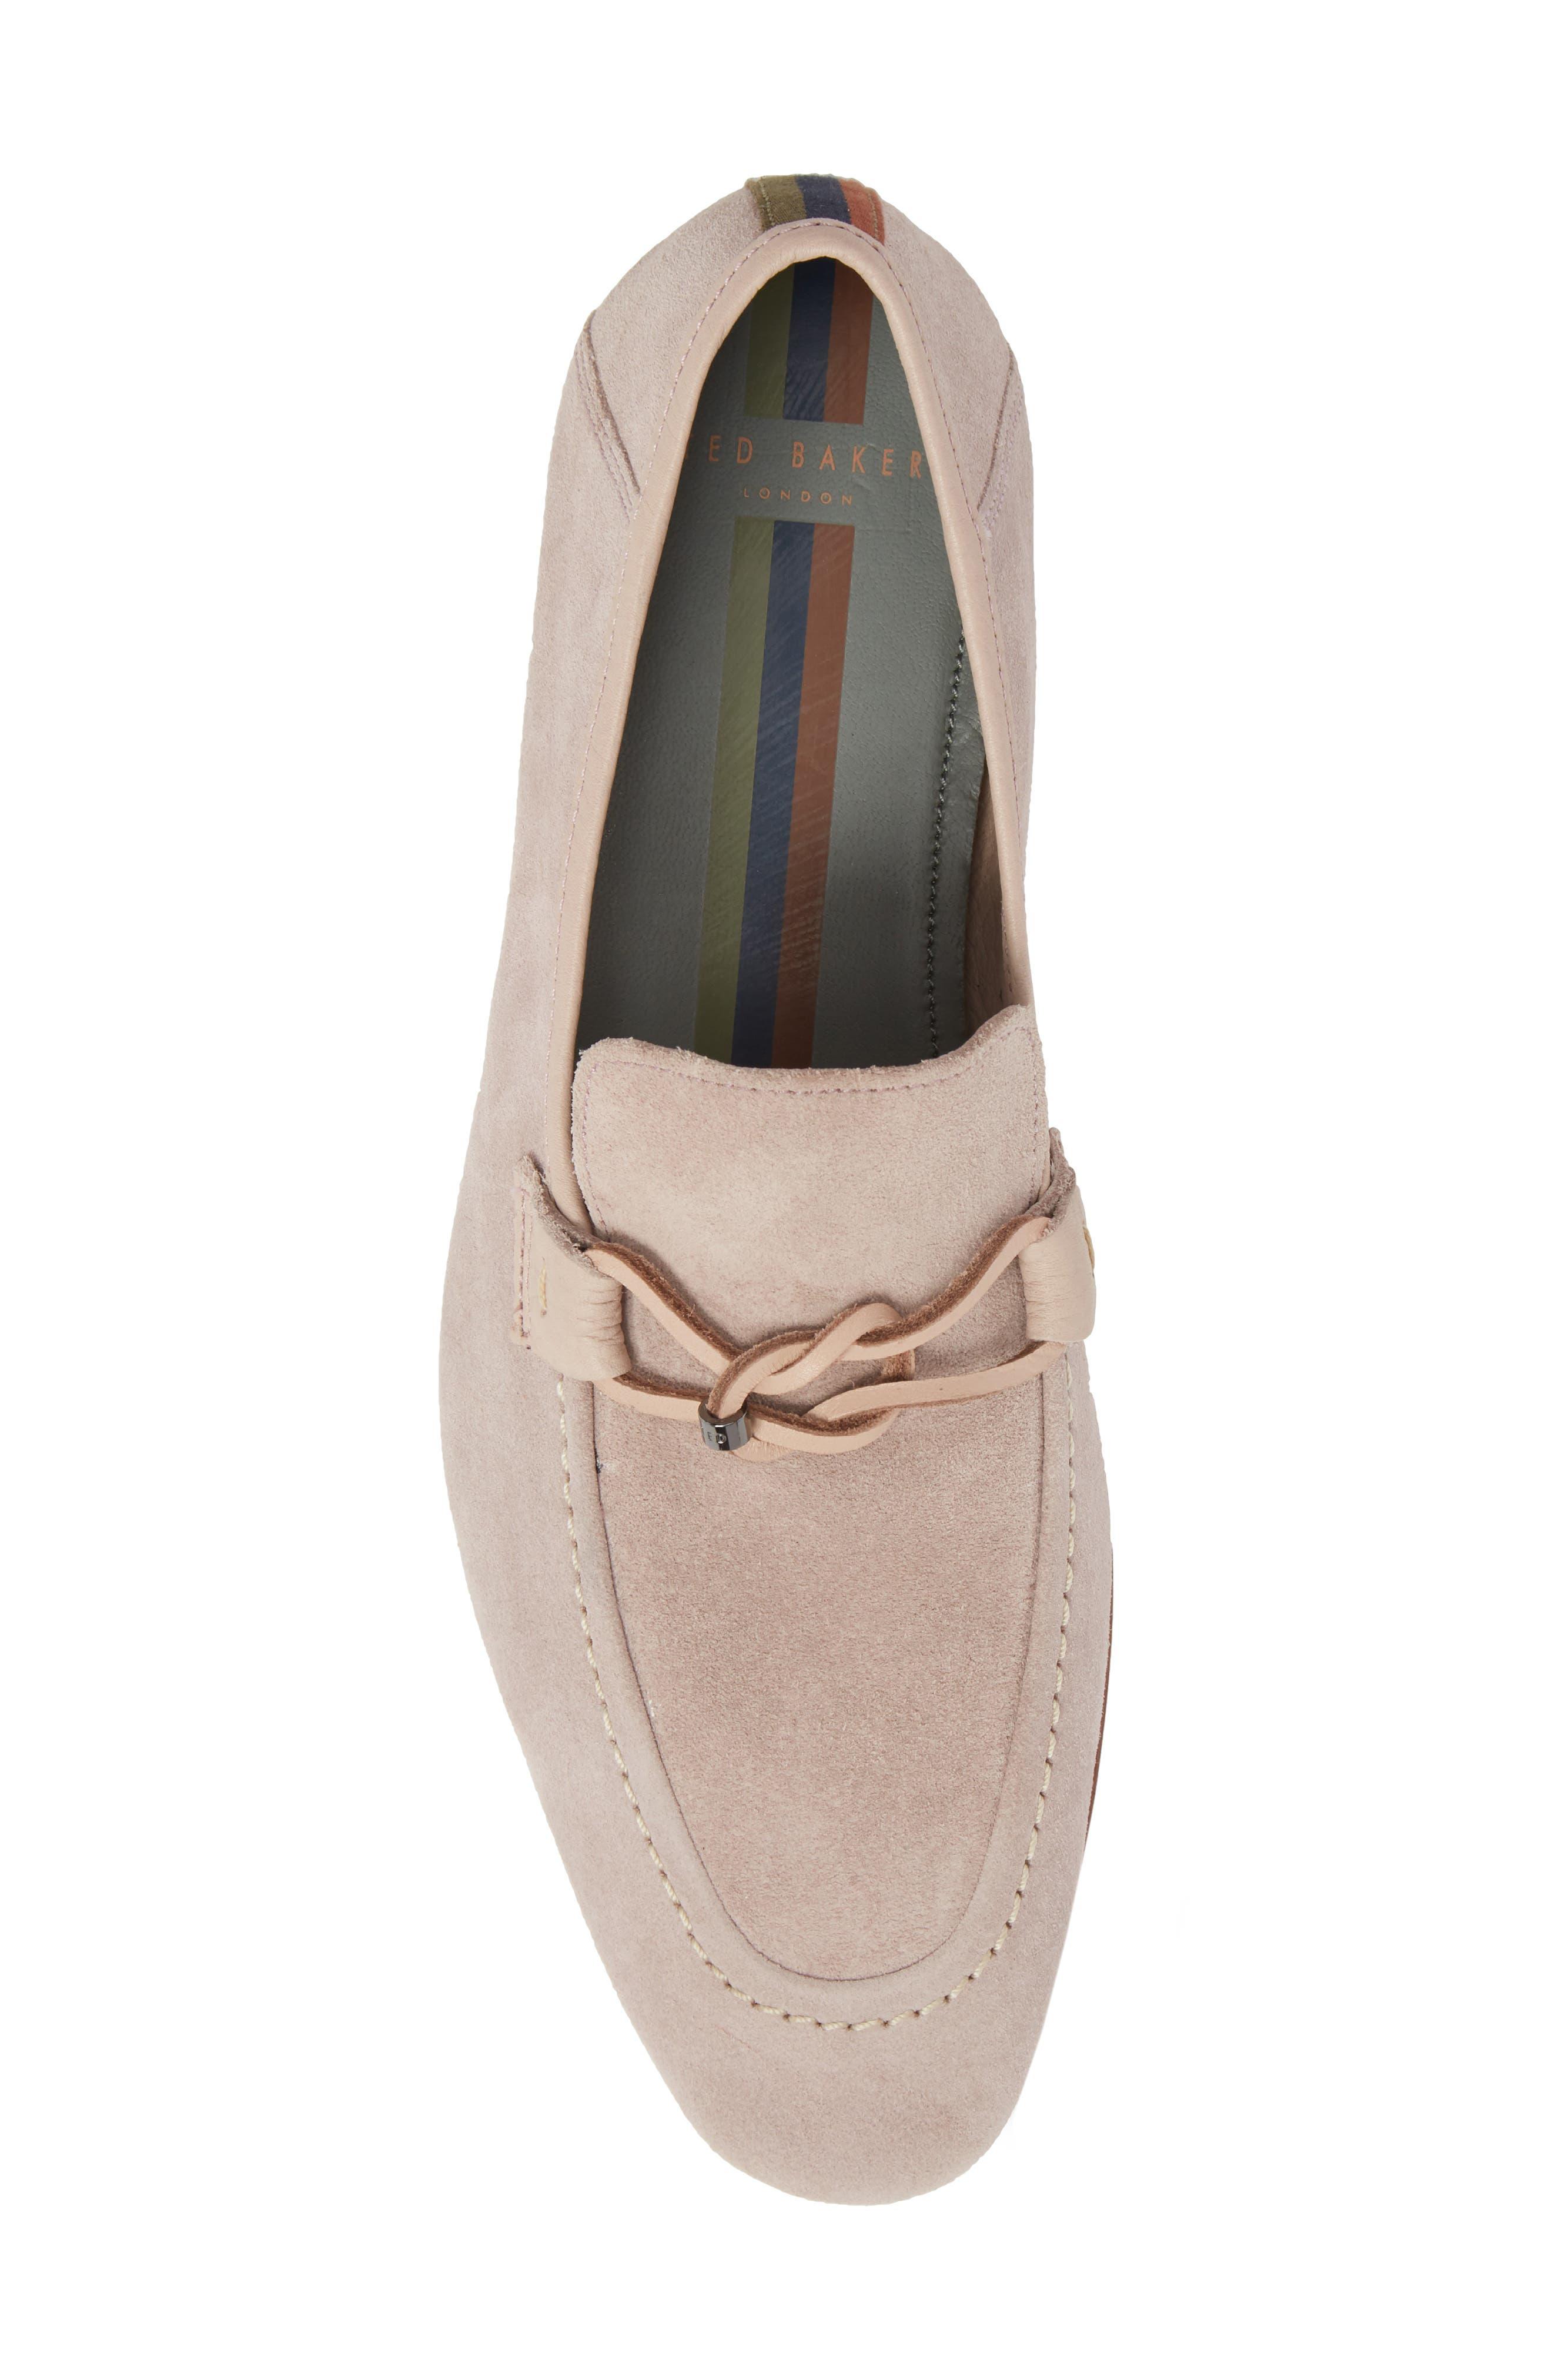 Hoppken Convertible Knotted Loafer,                             Alternate thumbnail 5, color,                             Light Pink Suede